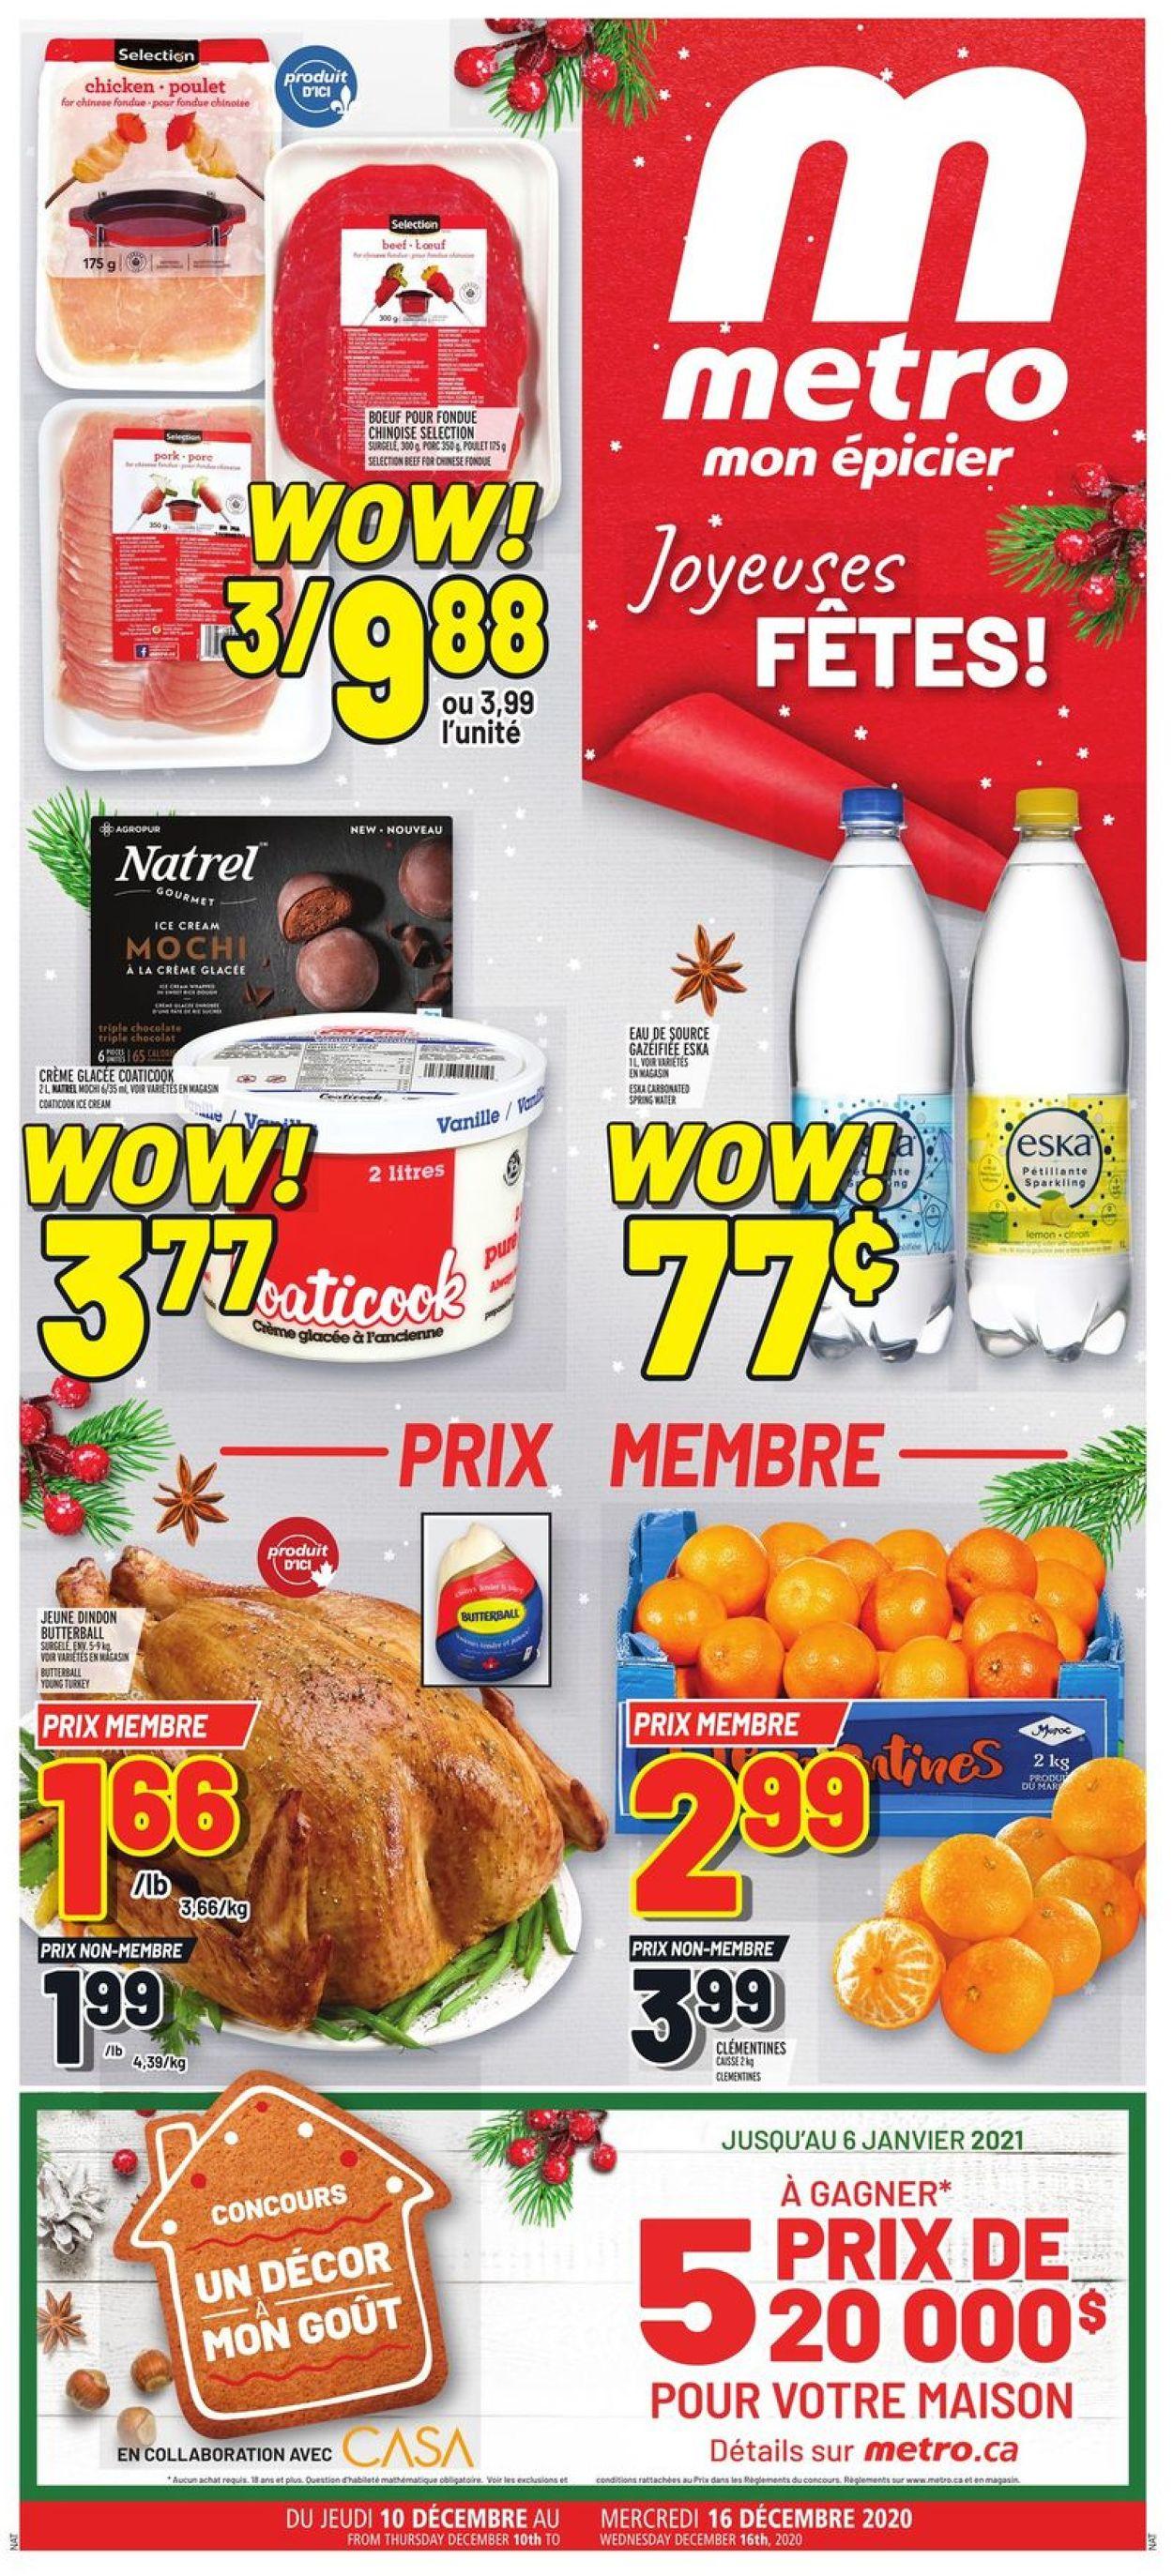 Metro - Christmas 2020 Flyer - 12/10-12/16/2020